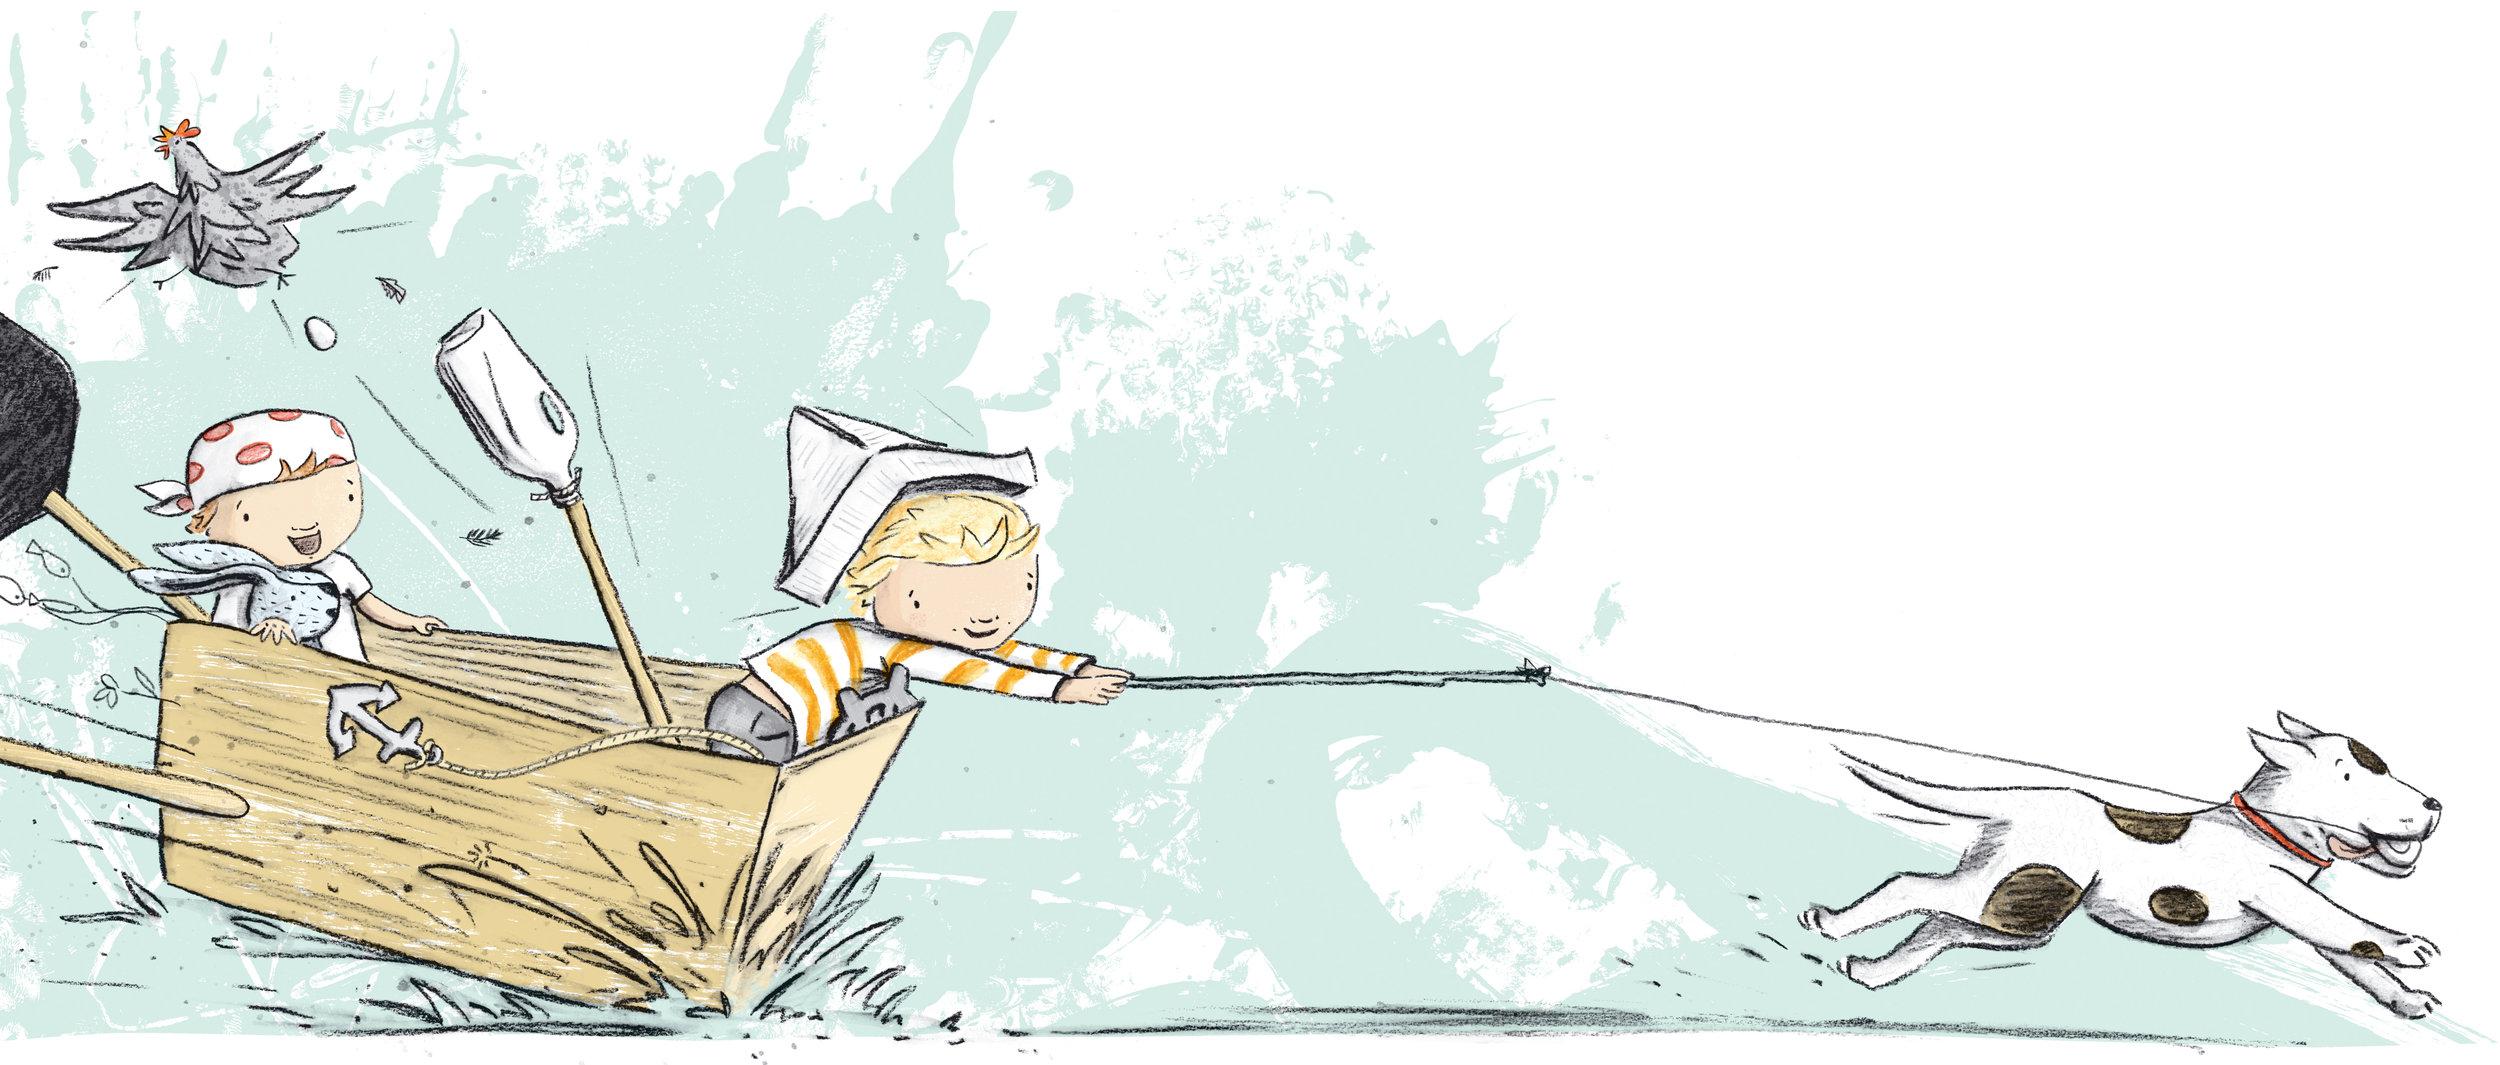 1, 2, Pirate Stew Illustration, Kylie Howarth